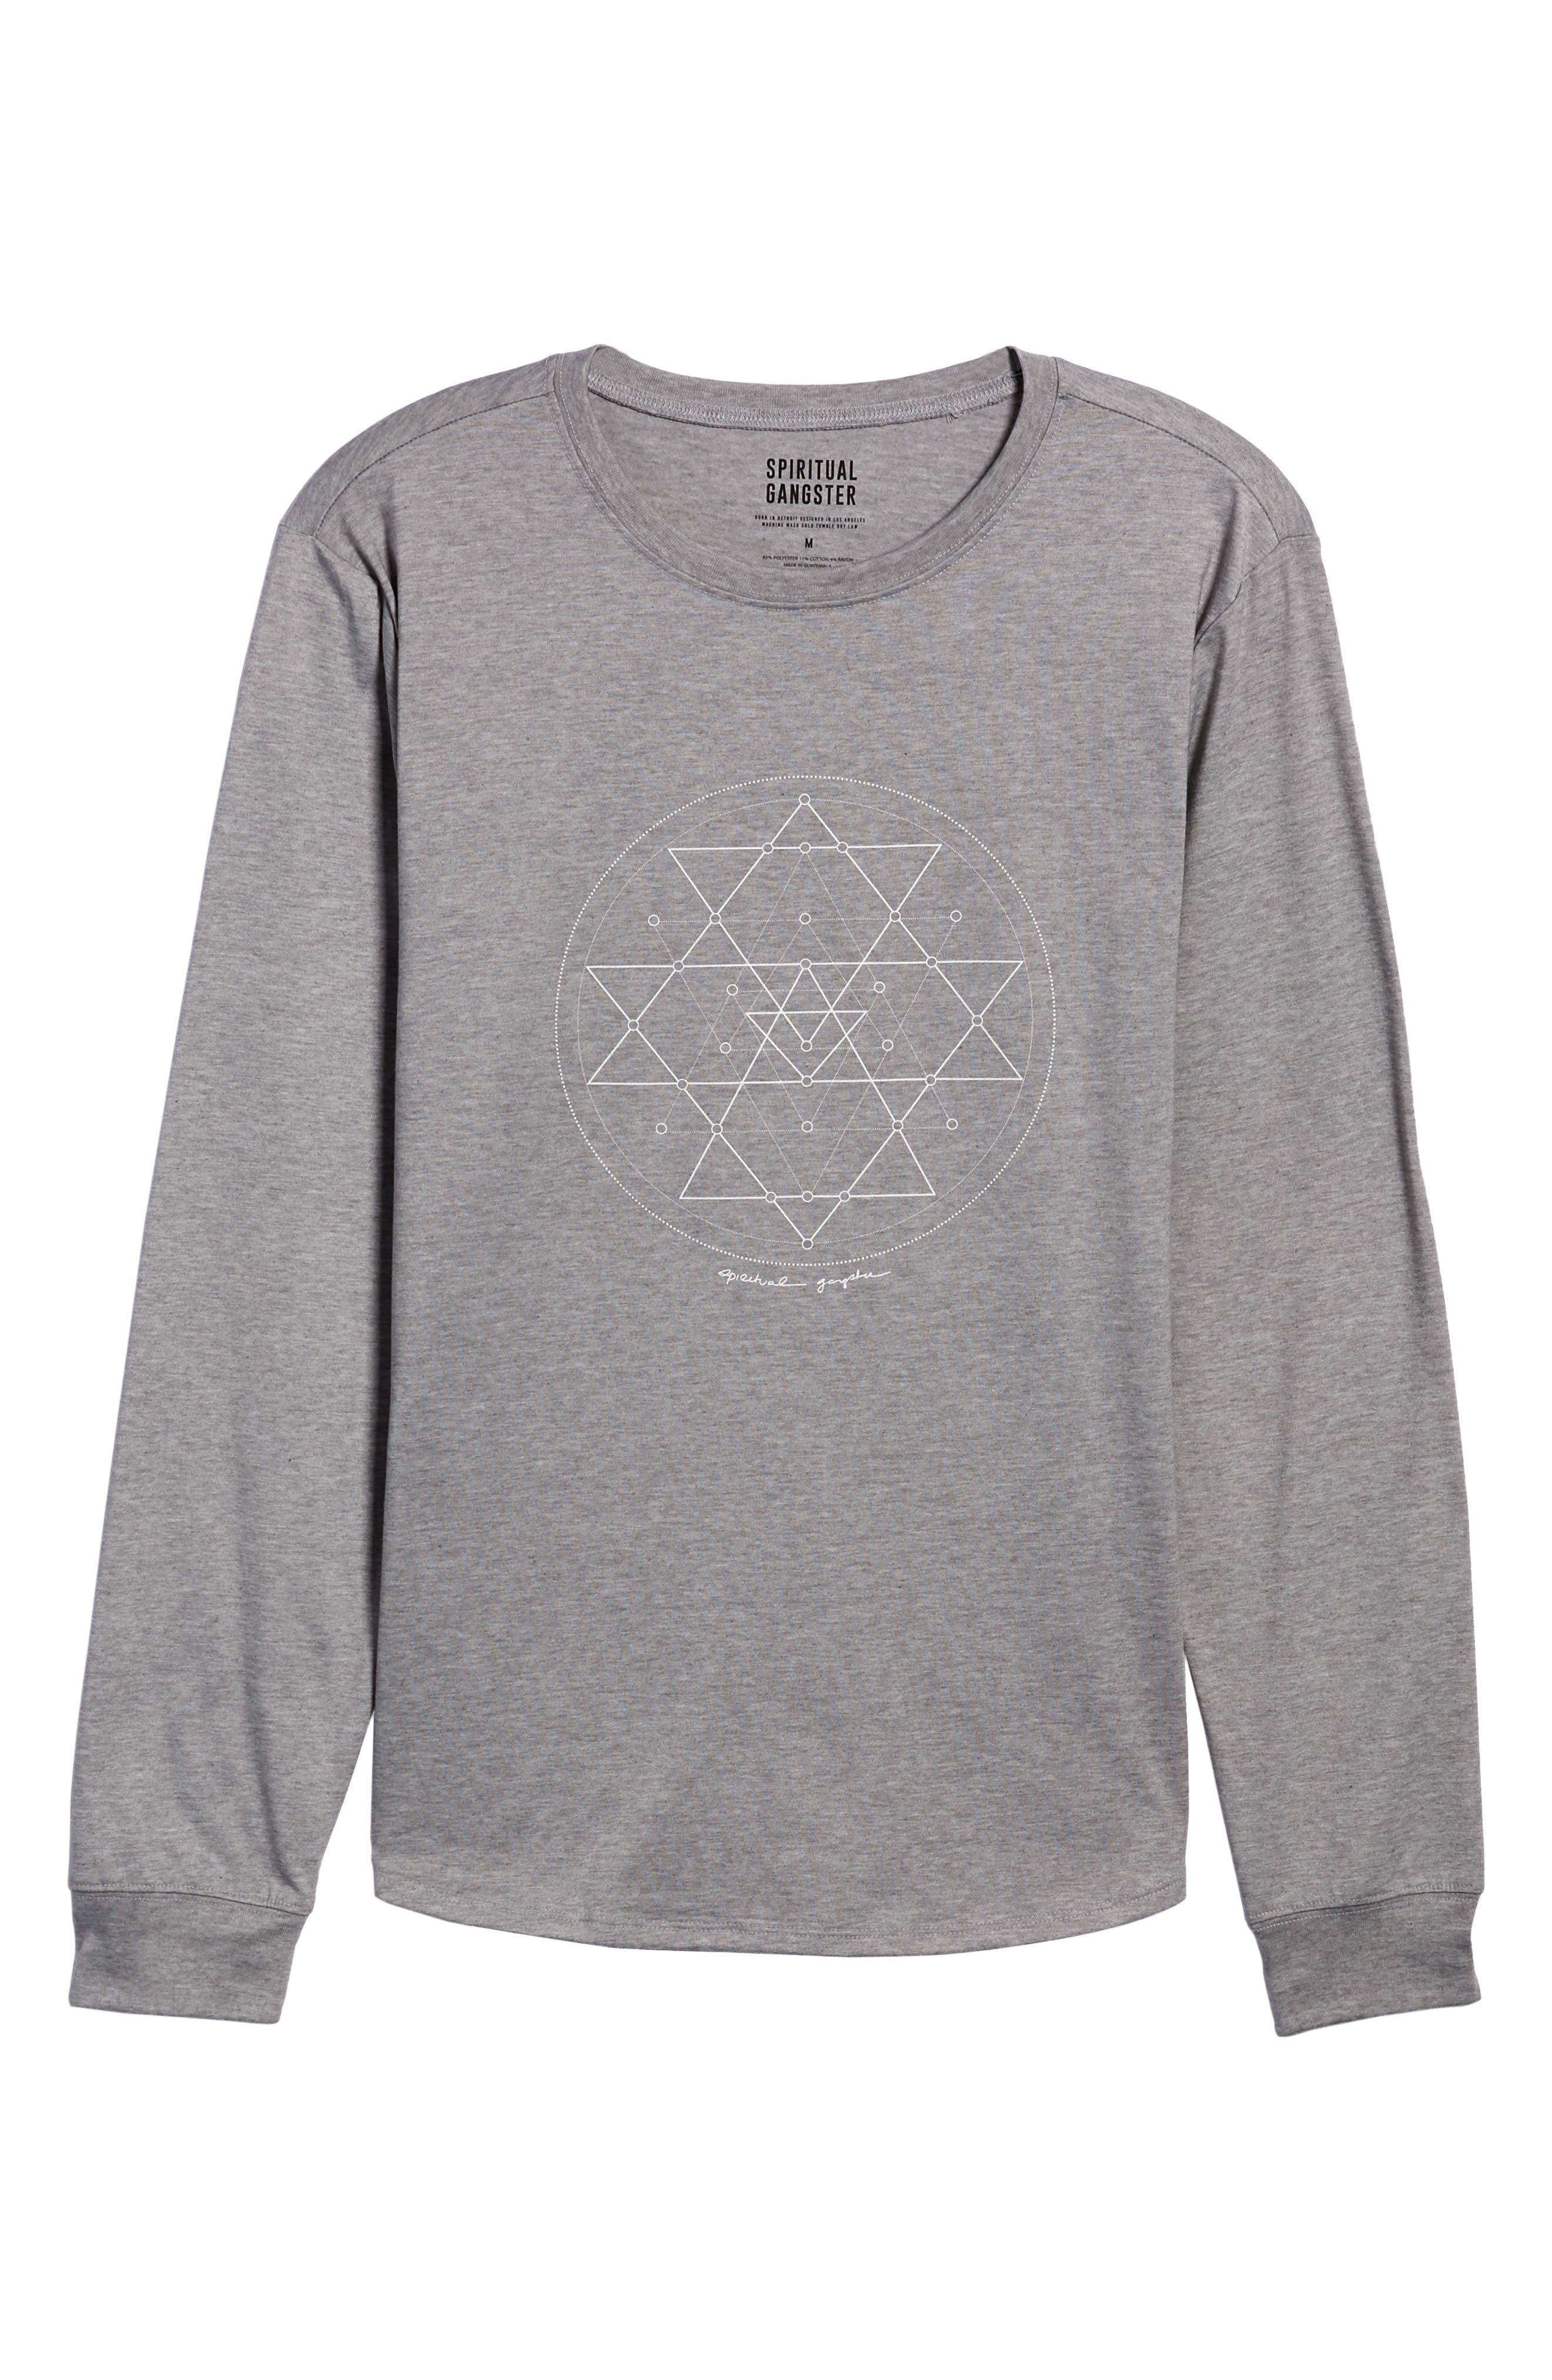 Yantra Long Sleeve T-Shirt,                             Alternate thumbnail 10, color,                             Heather Grey/ Heather Grey